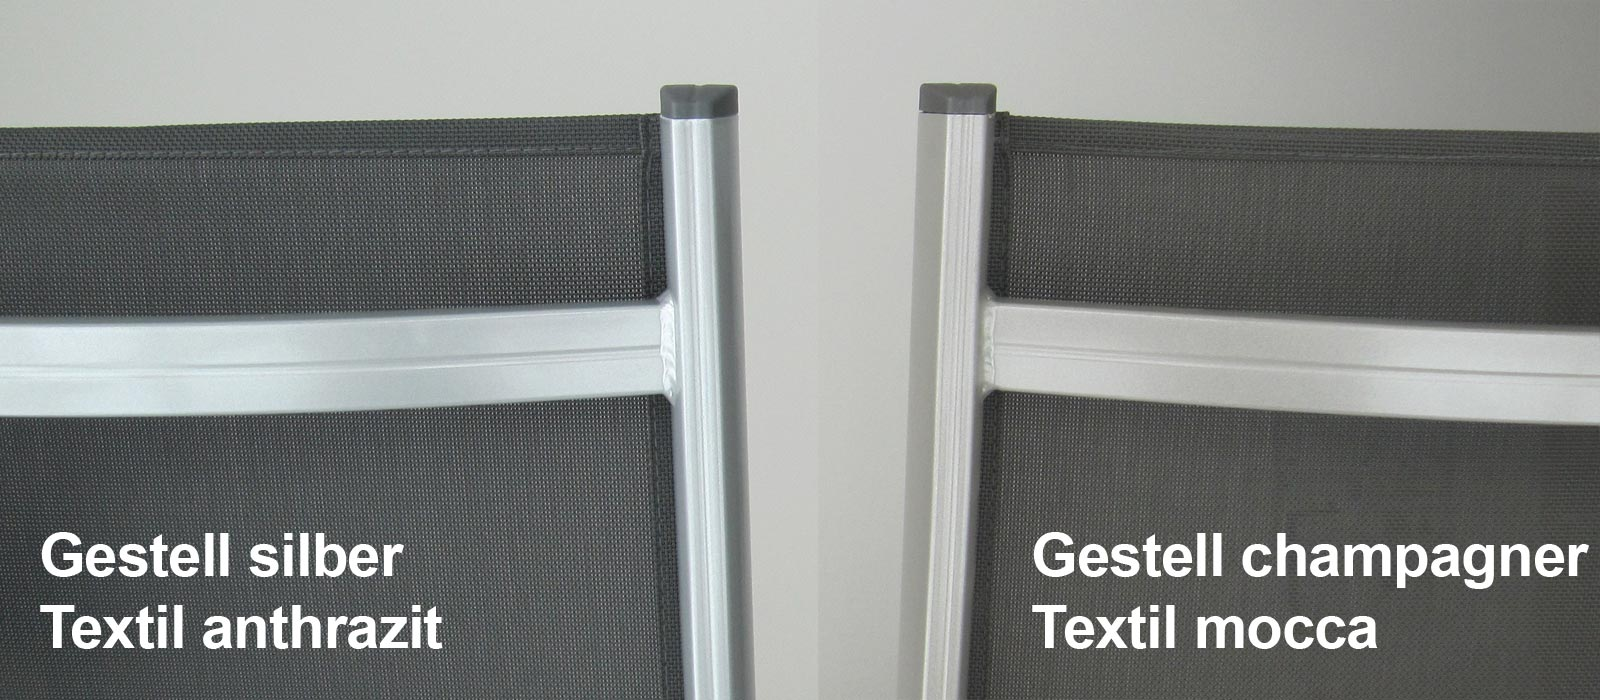 kettler gartenbank 2 sitzer basic plus 0301211 000 silber anthraz alu bei. Black Bedroom Furniture Sets. Home Design Ideas